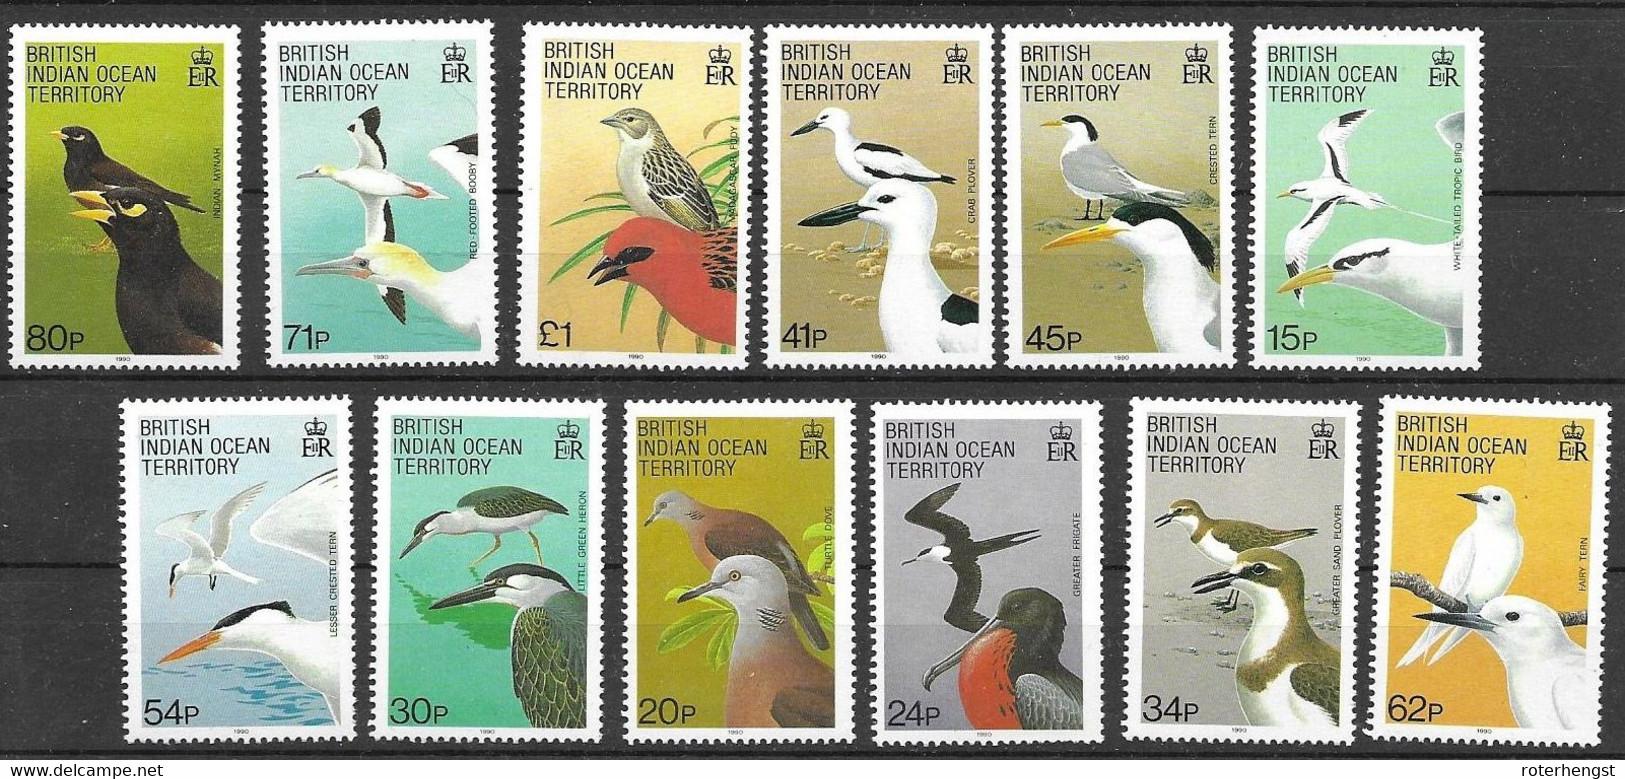 BIOT Mnh** Complete Set Birds 33 Euros 1990 - Unclassified